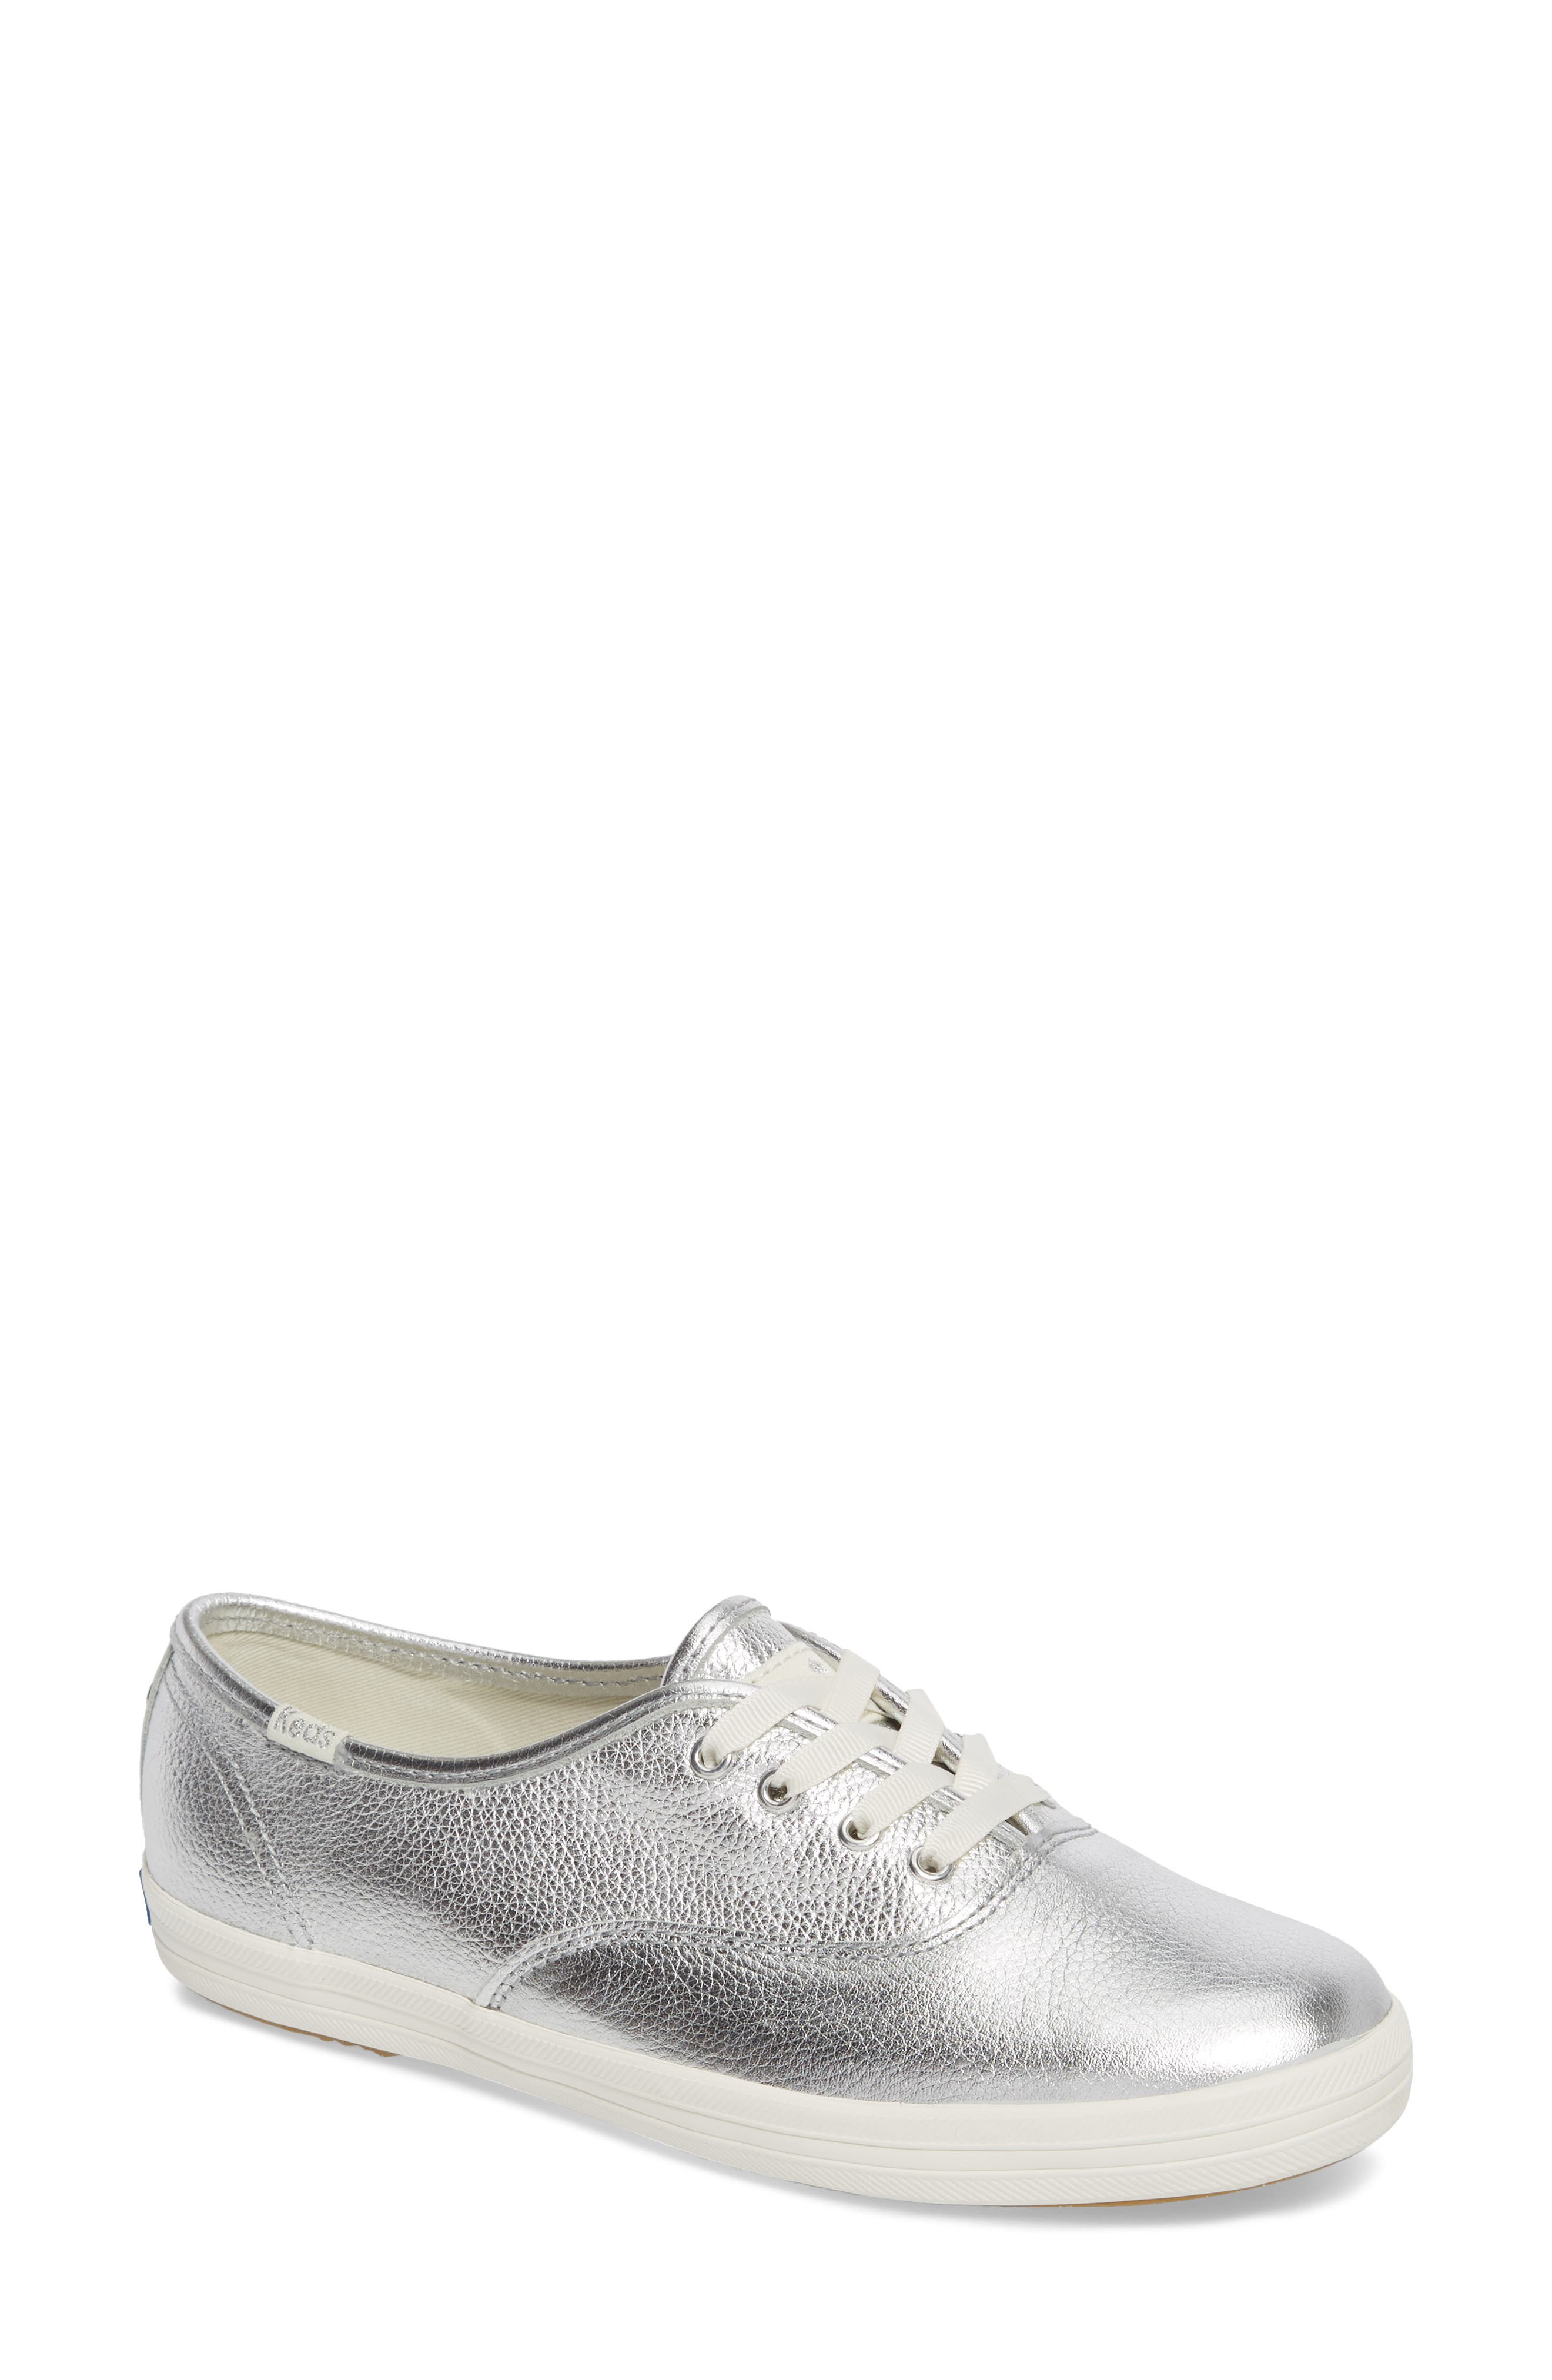 Keds® for kate spade new york metallic sneaker (Women)